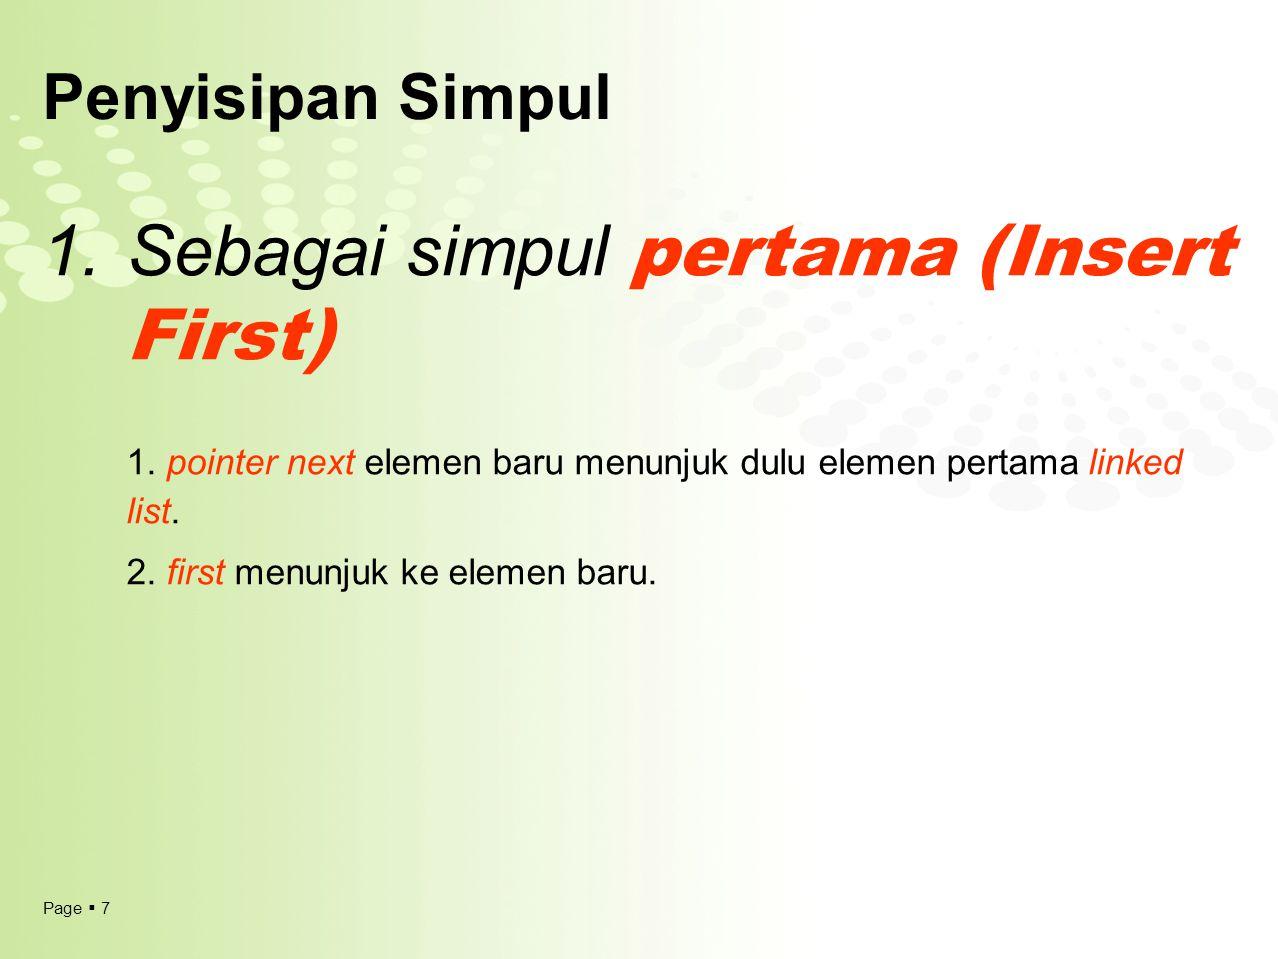 Page  7 Penyisipan Simpul 1.Sebagai simpul pertama (Insert First) 1. pointer next elemen baru menunjuk dulu elemen pertama linked list. 2. first menu